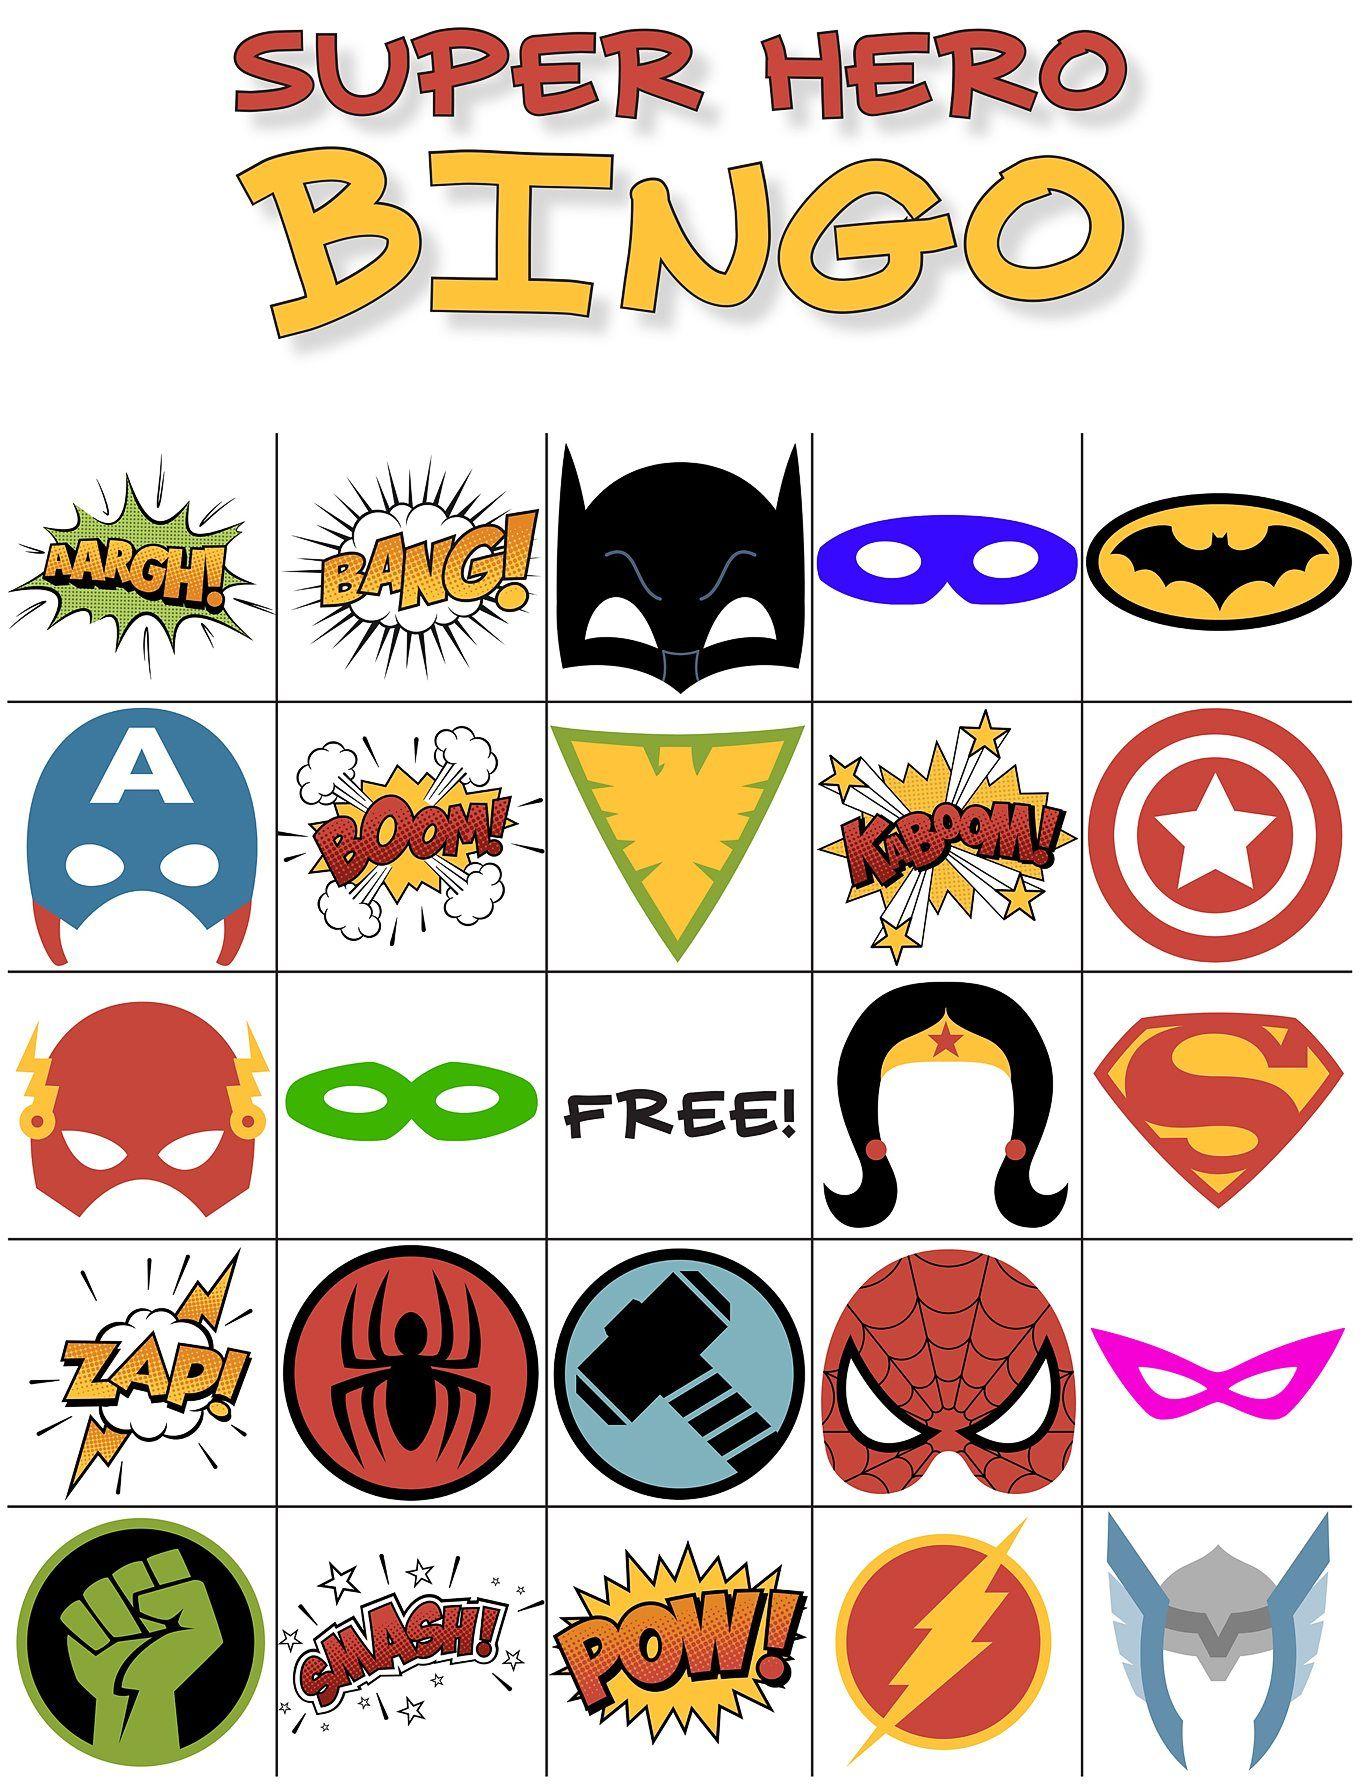 The Best Free Printable Superhero Bingo Game | Super Héros - Free Printable Superhero Pictures